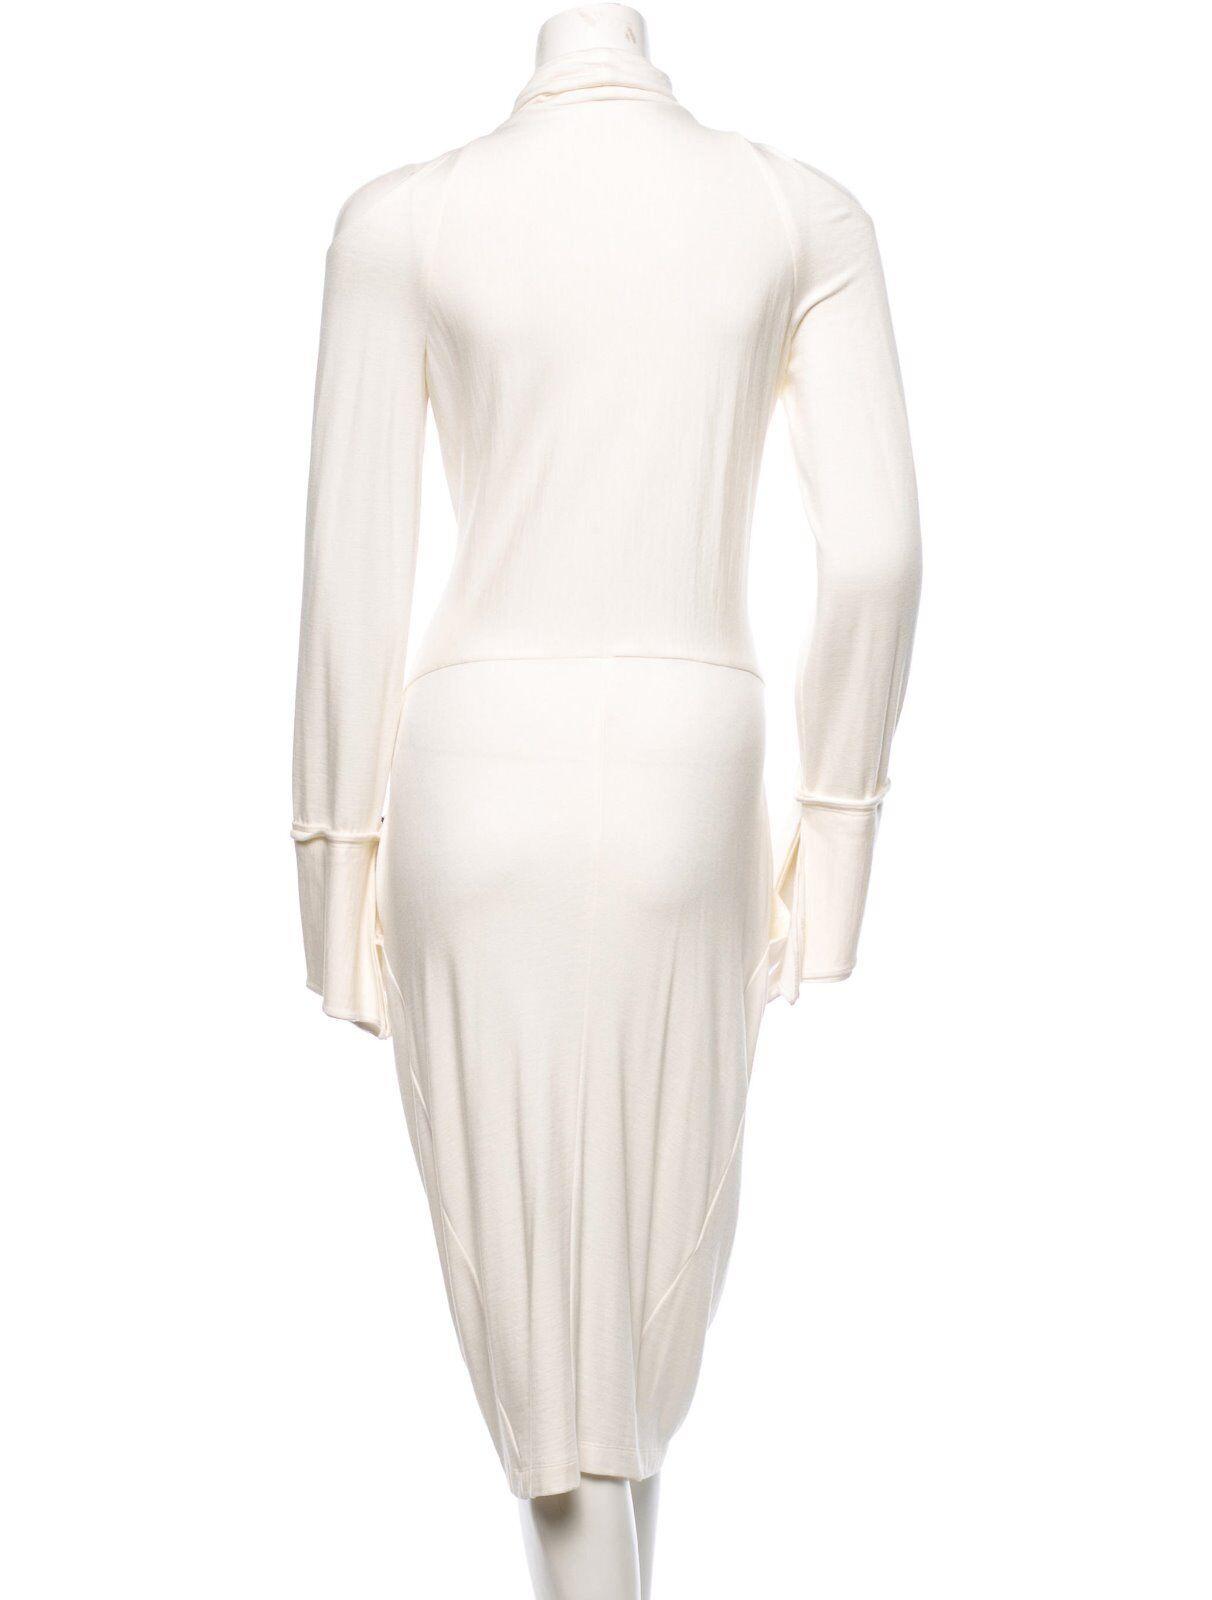 SPECTACULAR NWT  2,695 women KARAN KARAN KARAN IVORY COLD SHOULDER DRESS 6f1338